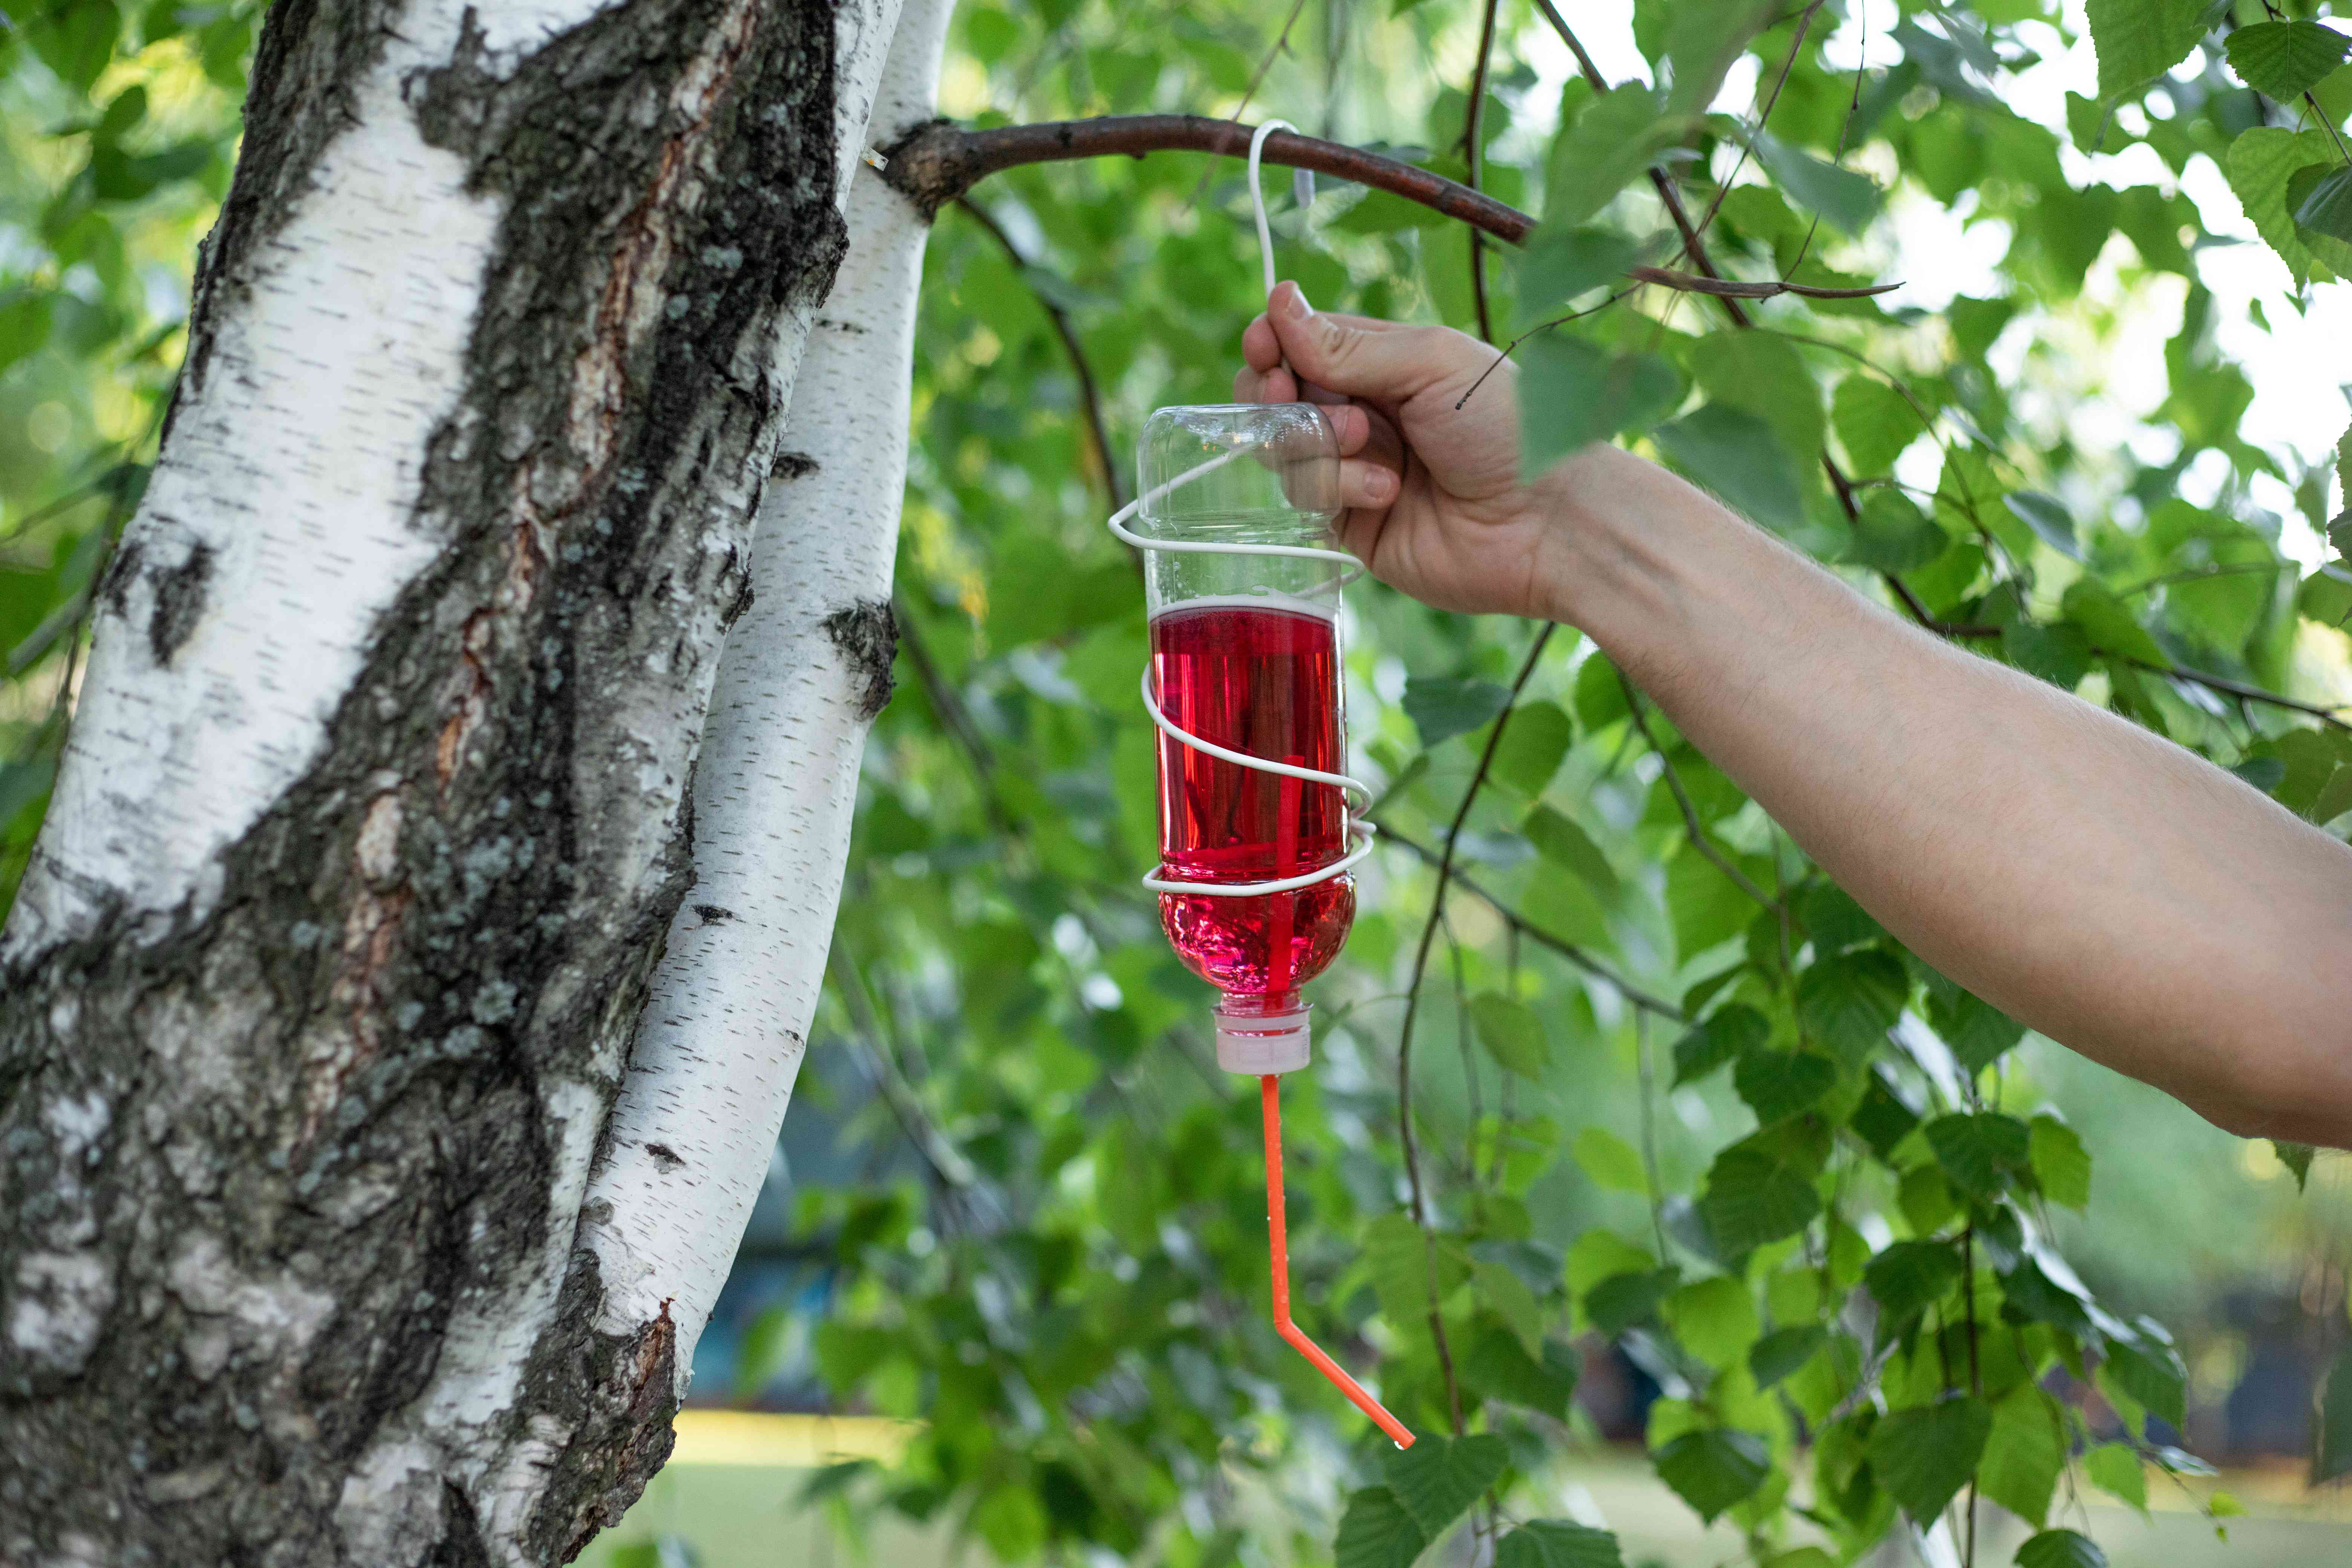 arm hangs diy hummingbird feeder from its coat hanger hook onto tree